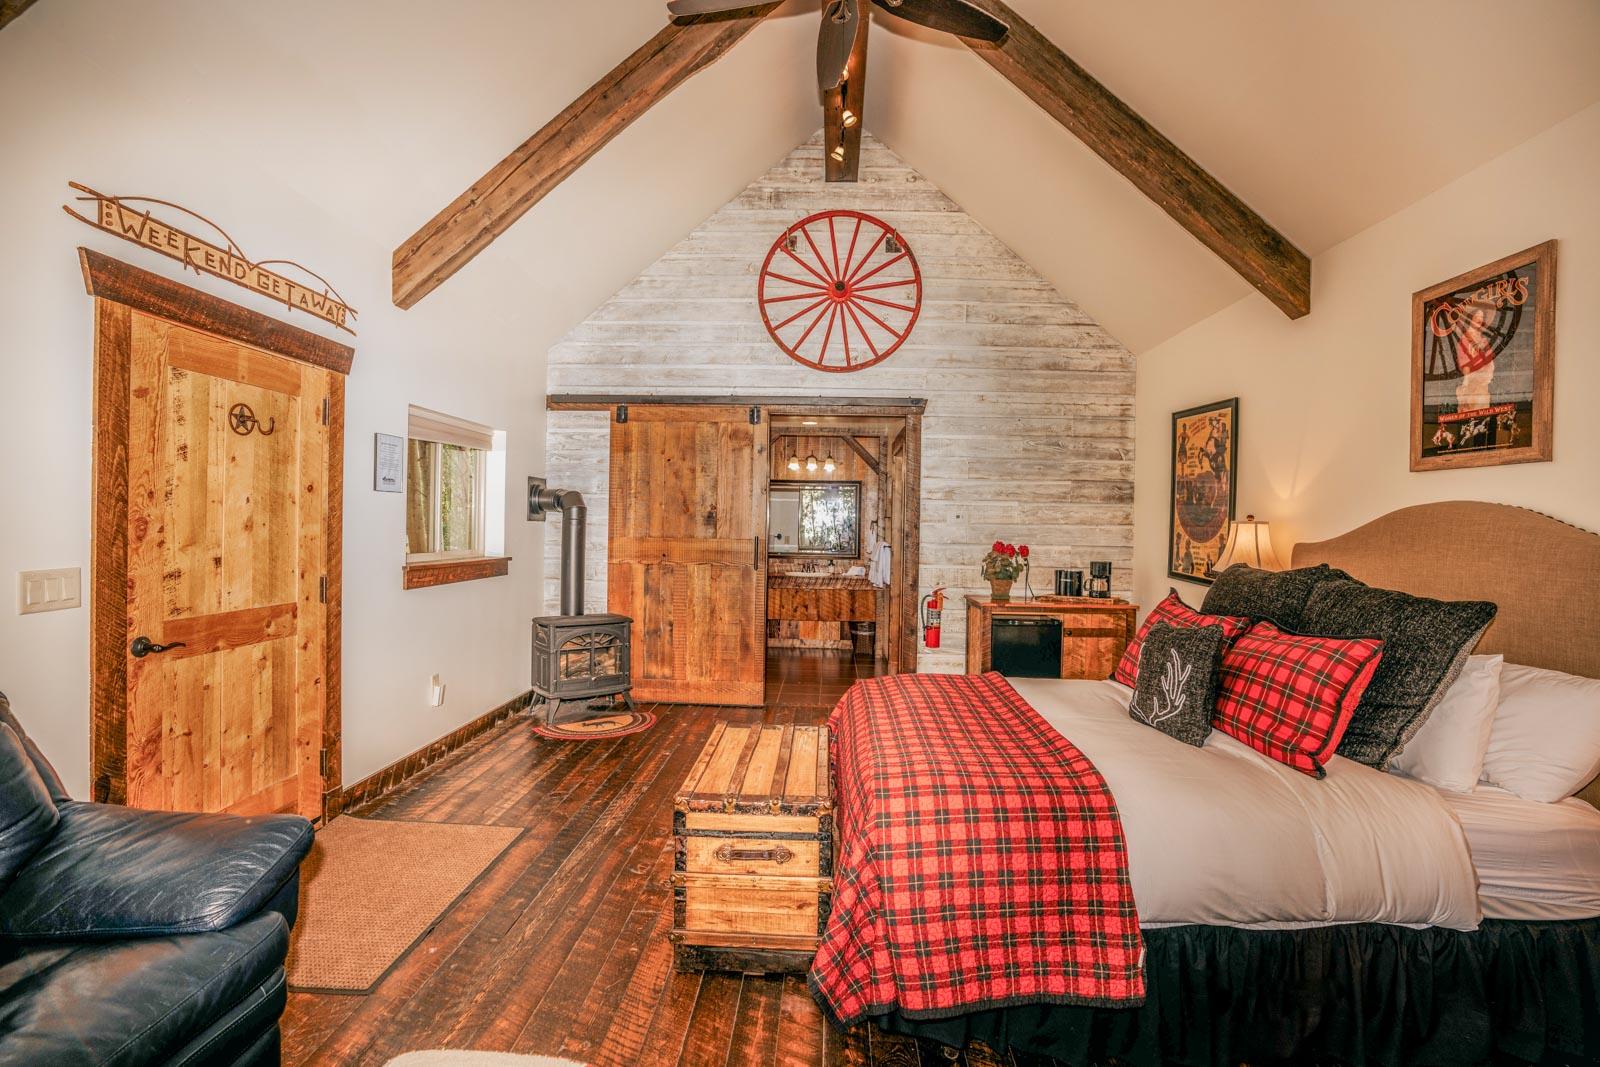 jackson-hole-lodging-deals-rendezvous-cabins